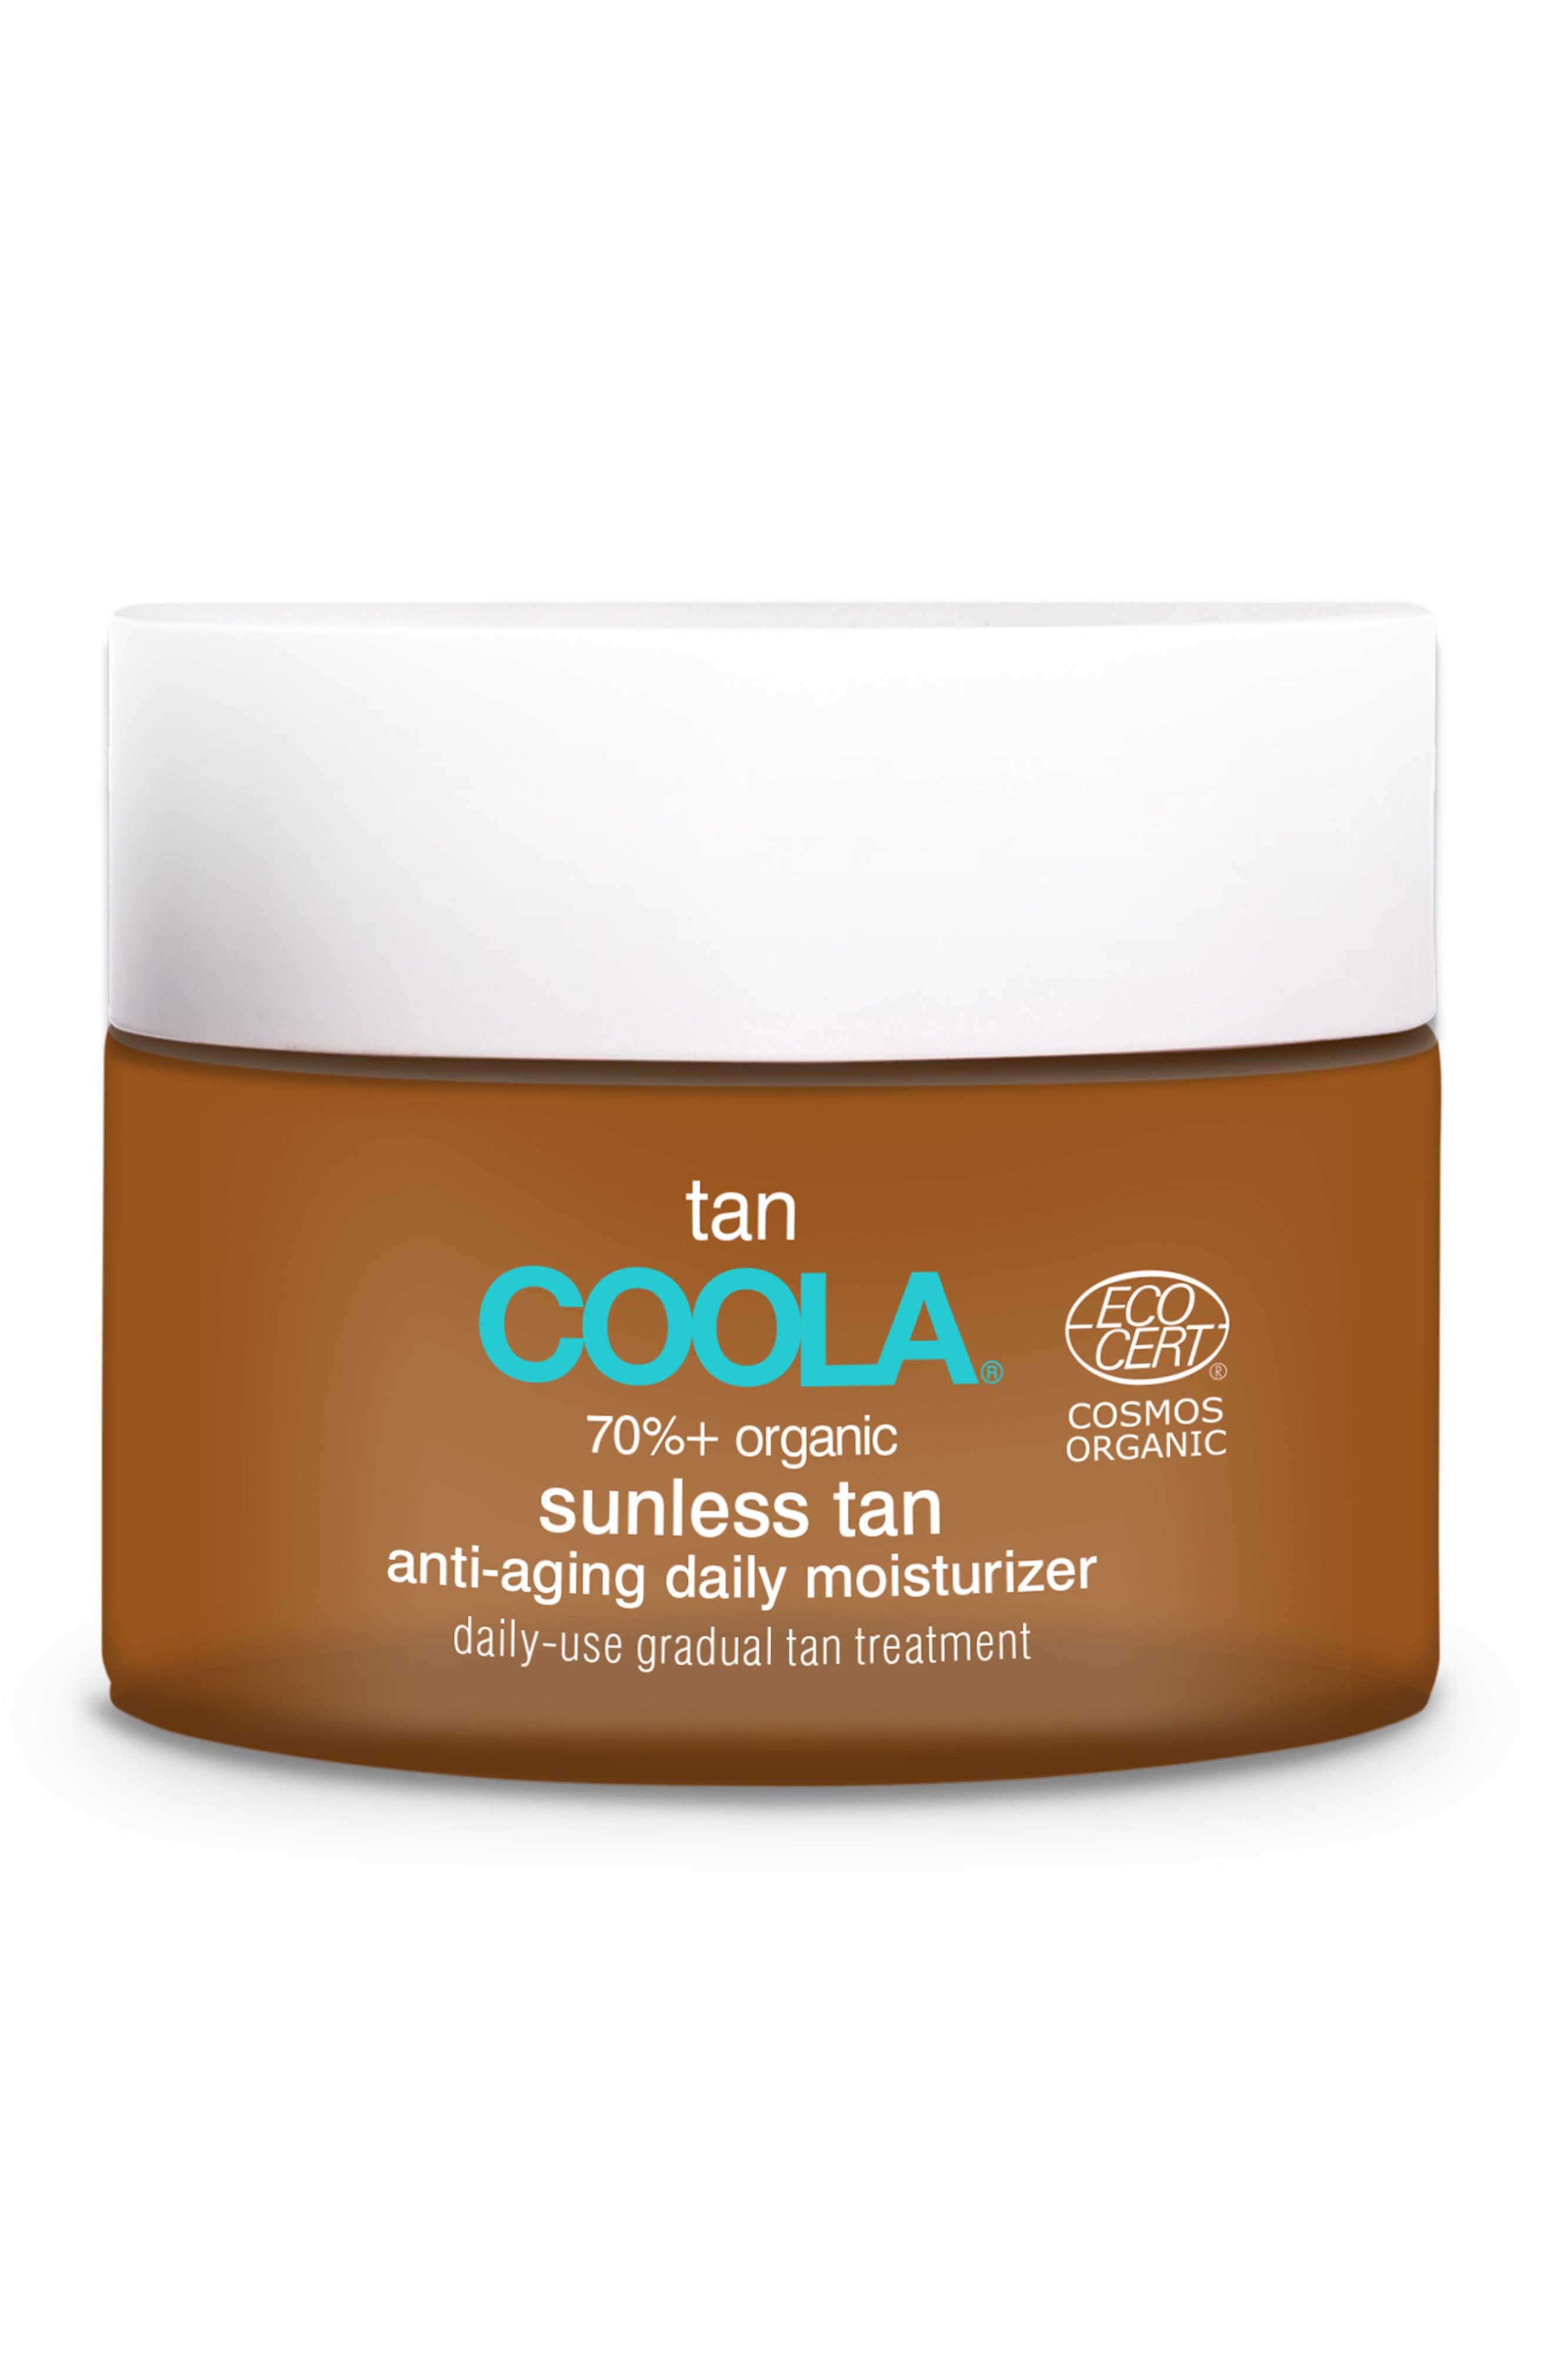 Coola Sunless Tan Anti-Aging Daily Moisturizer